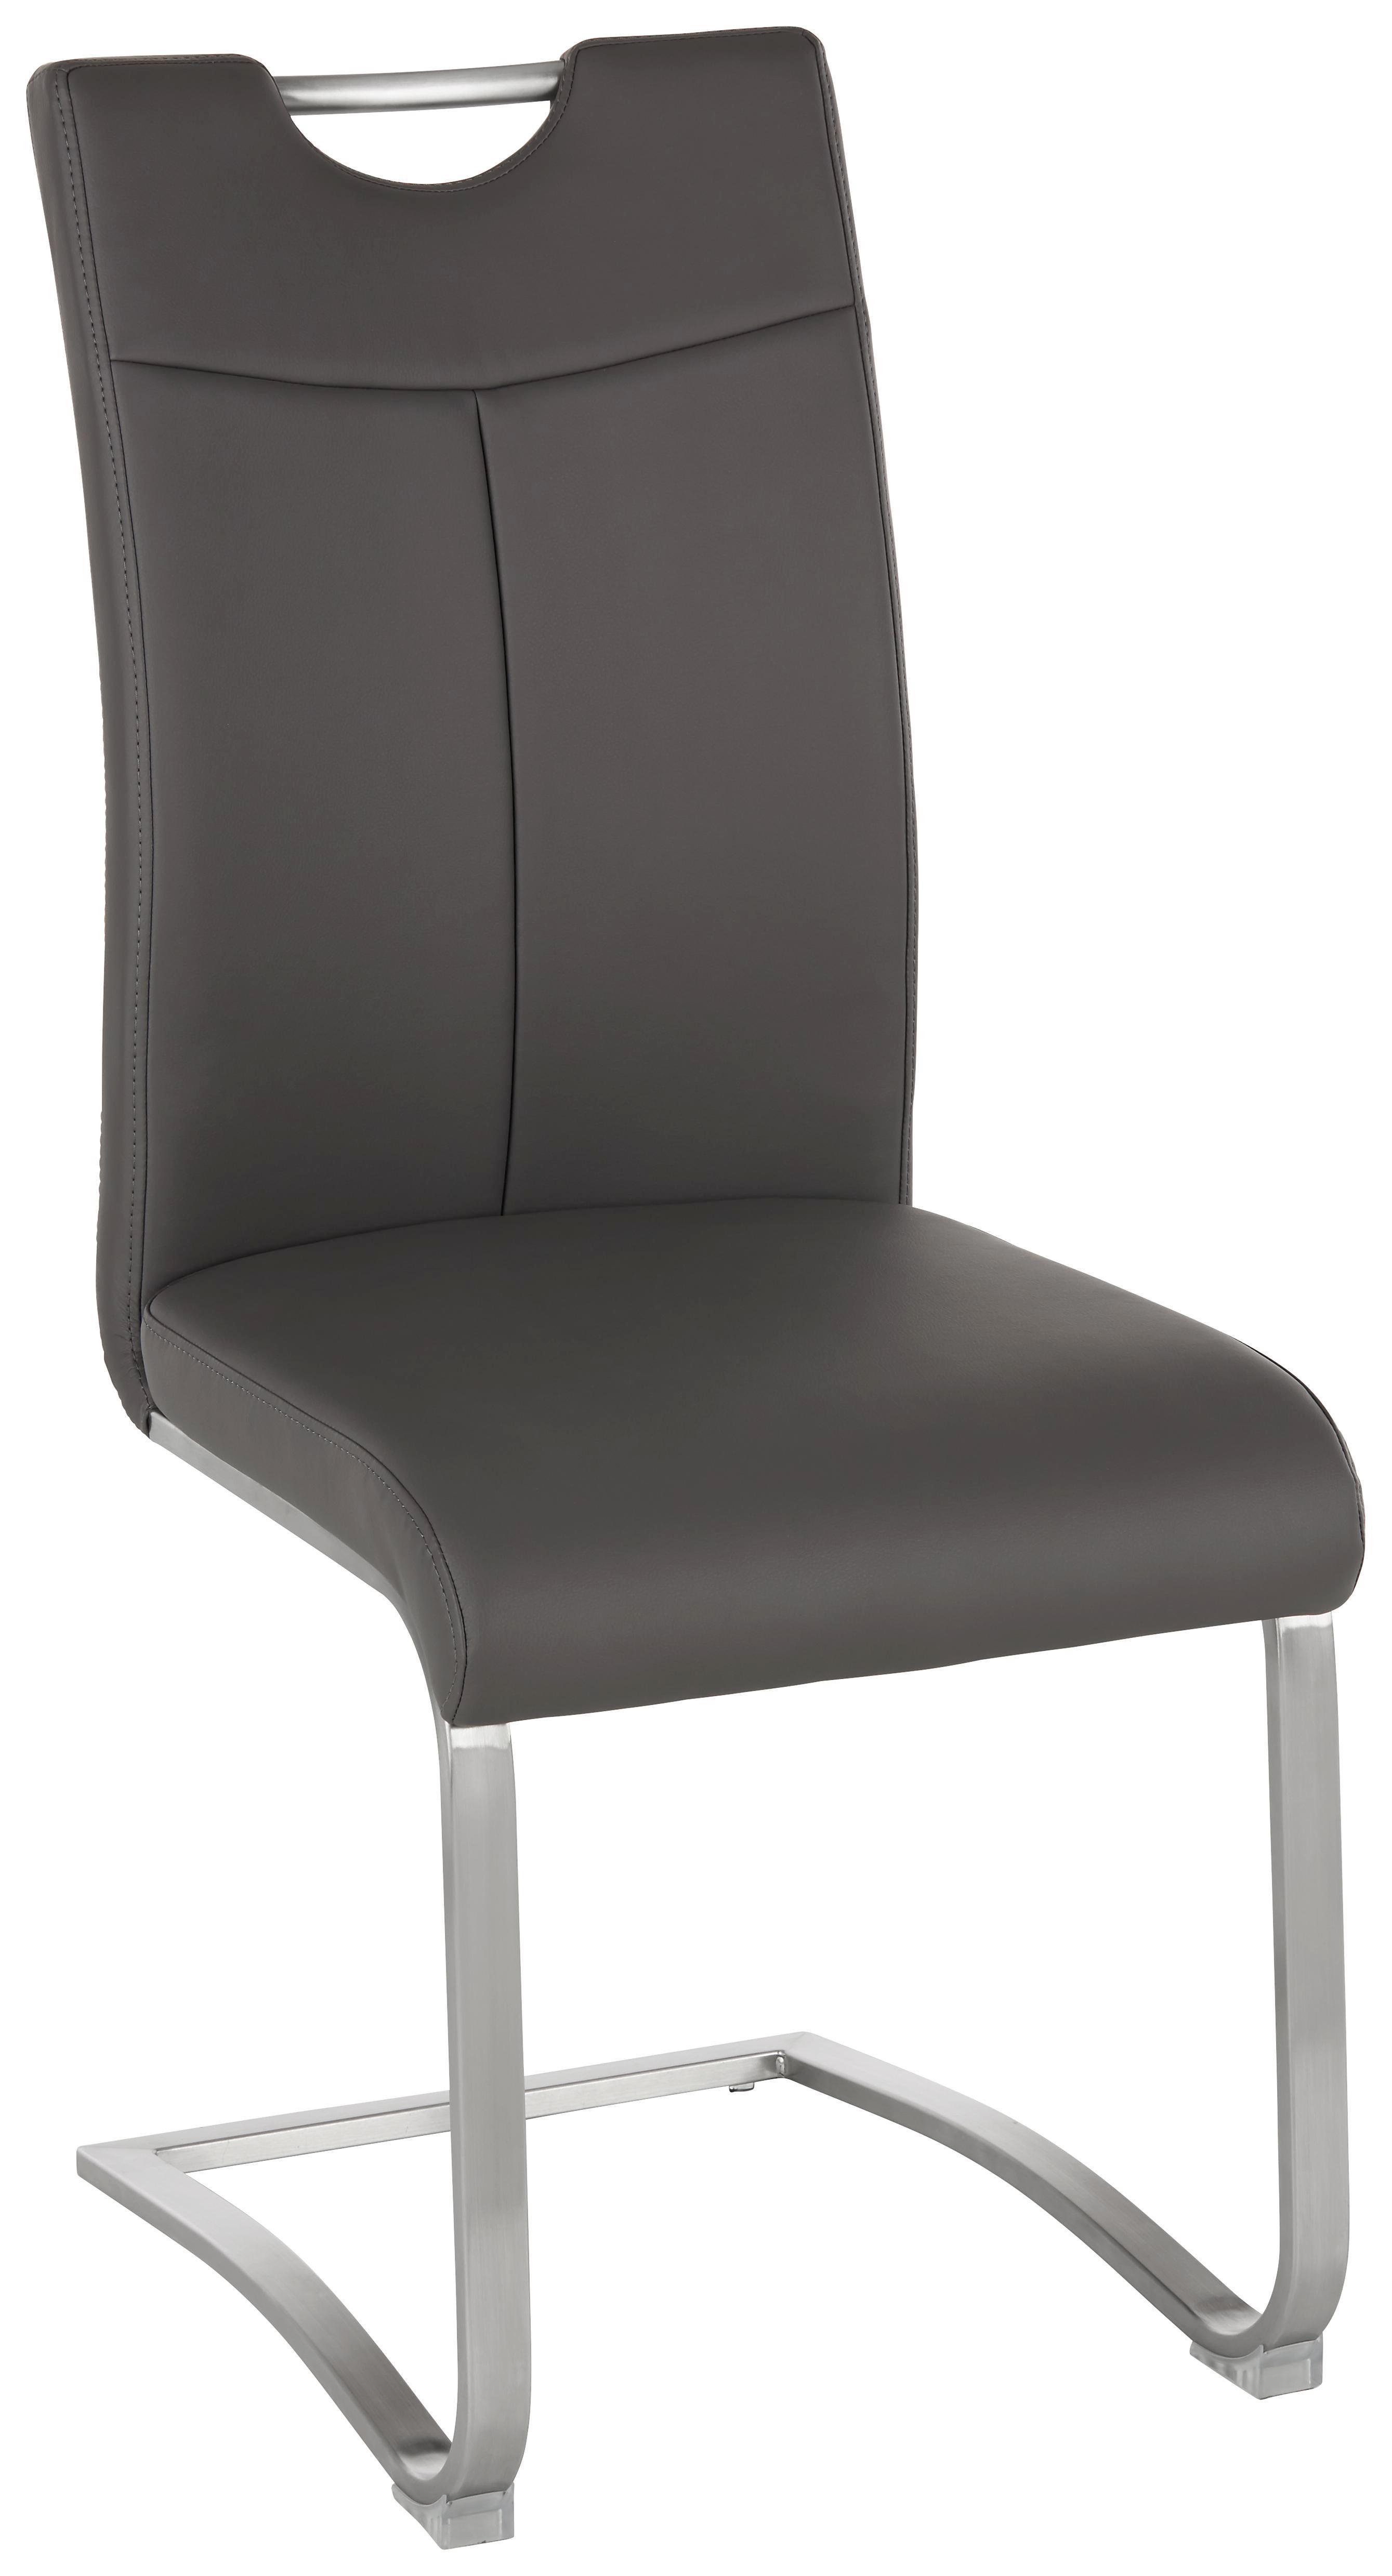 Schwingstuhl in Grau/edelstahlfarben - Edelstahlfarben/Grau, MODERN, Textil/Metall (45/101/59cm) - PREMIUM LIVING